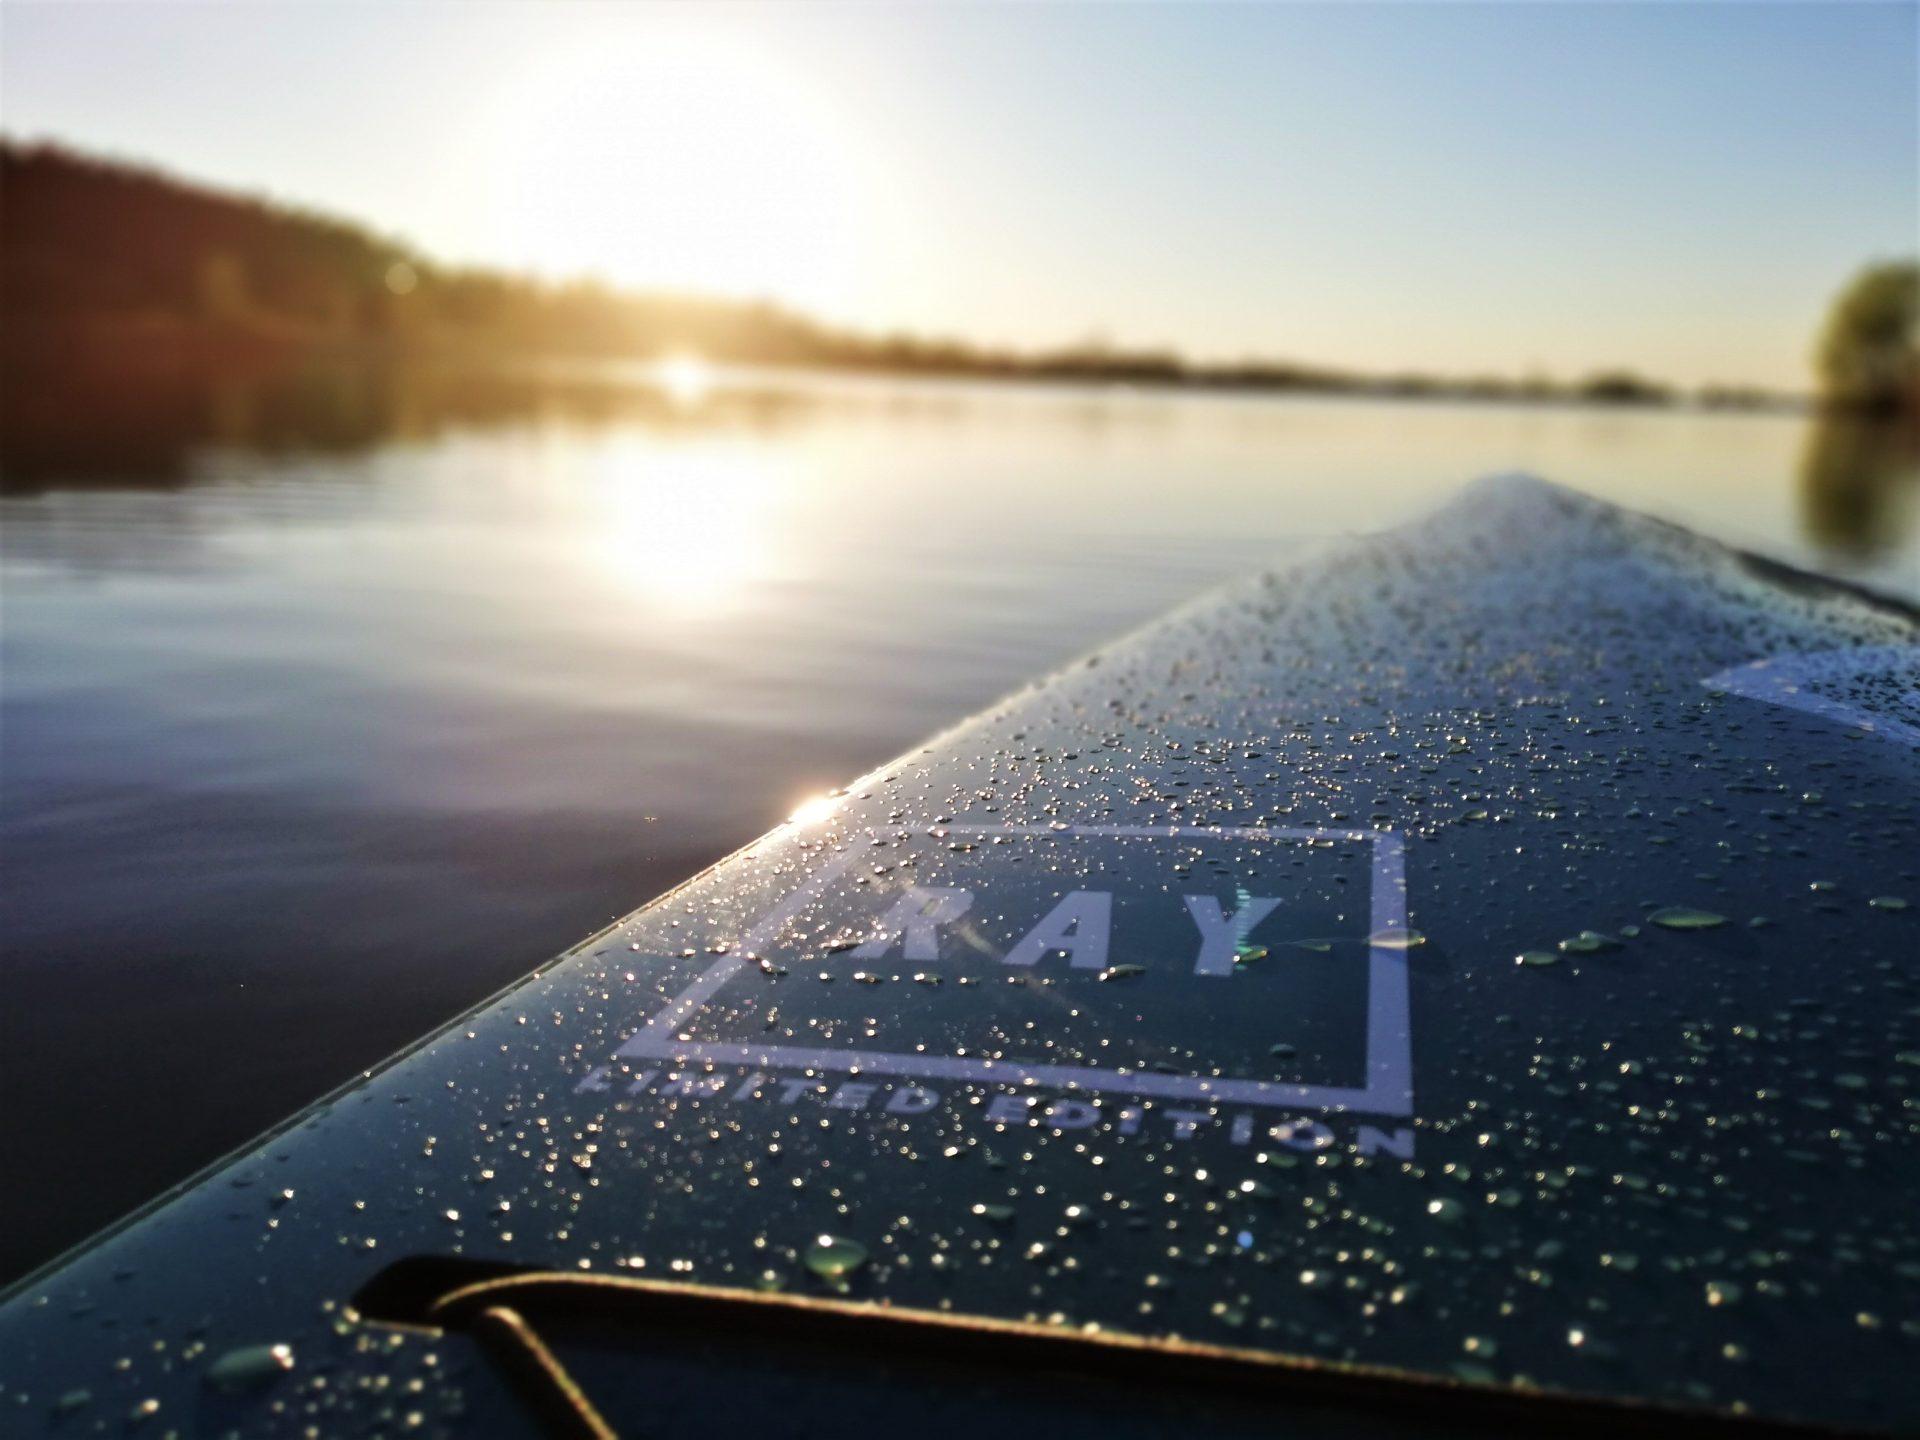 Sonnenuntergang Wasser